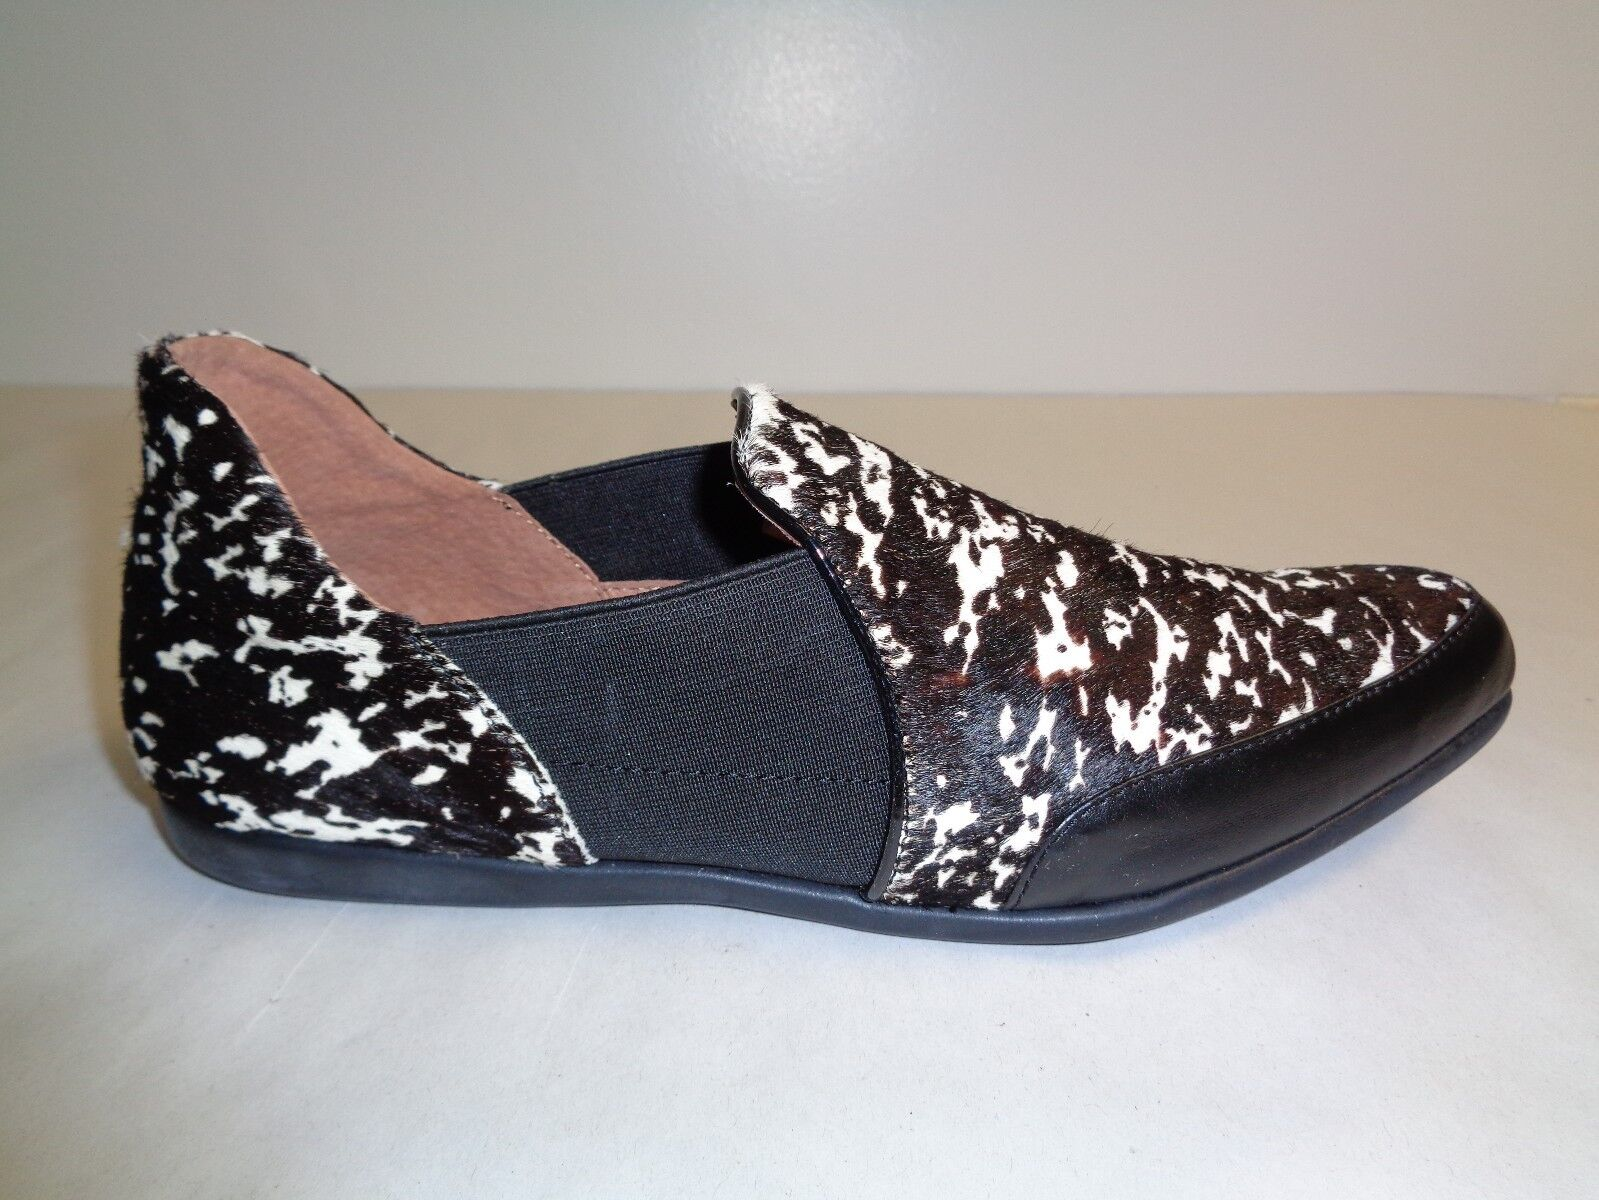 Adrianna Papell tamaño 8 M Lola Negro Persa Persa Persa haircalf Nuevos Mujer Zapatos sin Taco  diseñador en linea